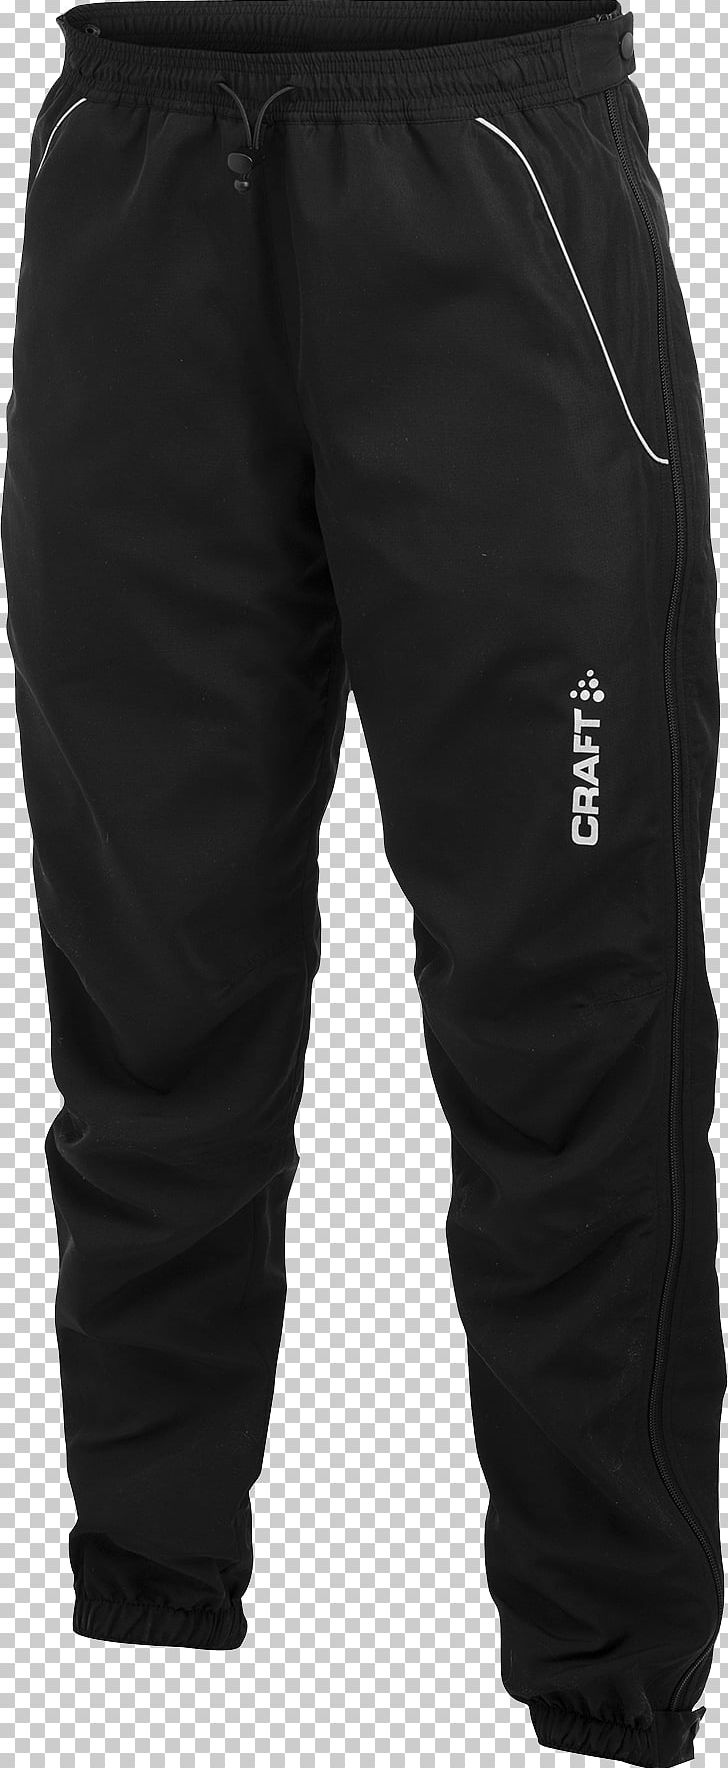 T shirt slim fit. Pants clipart black thing